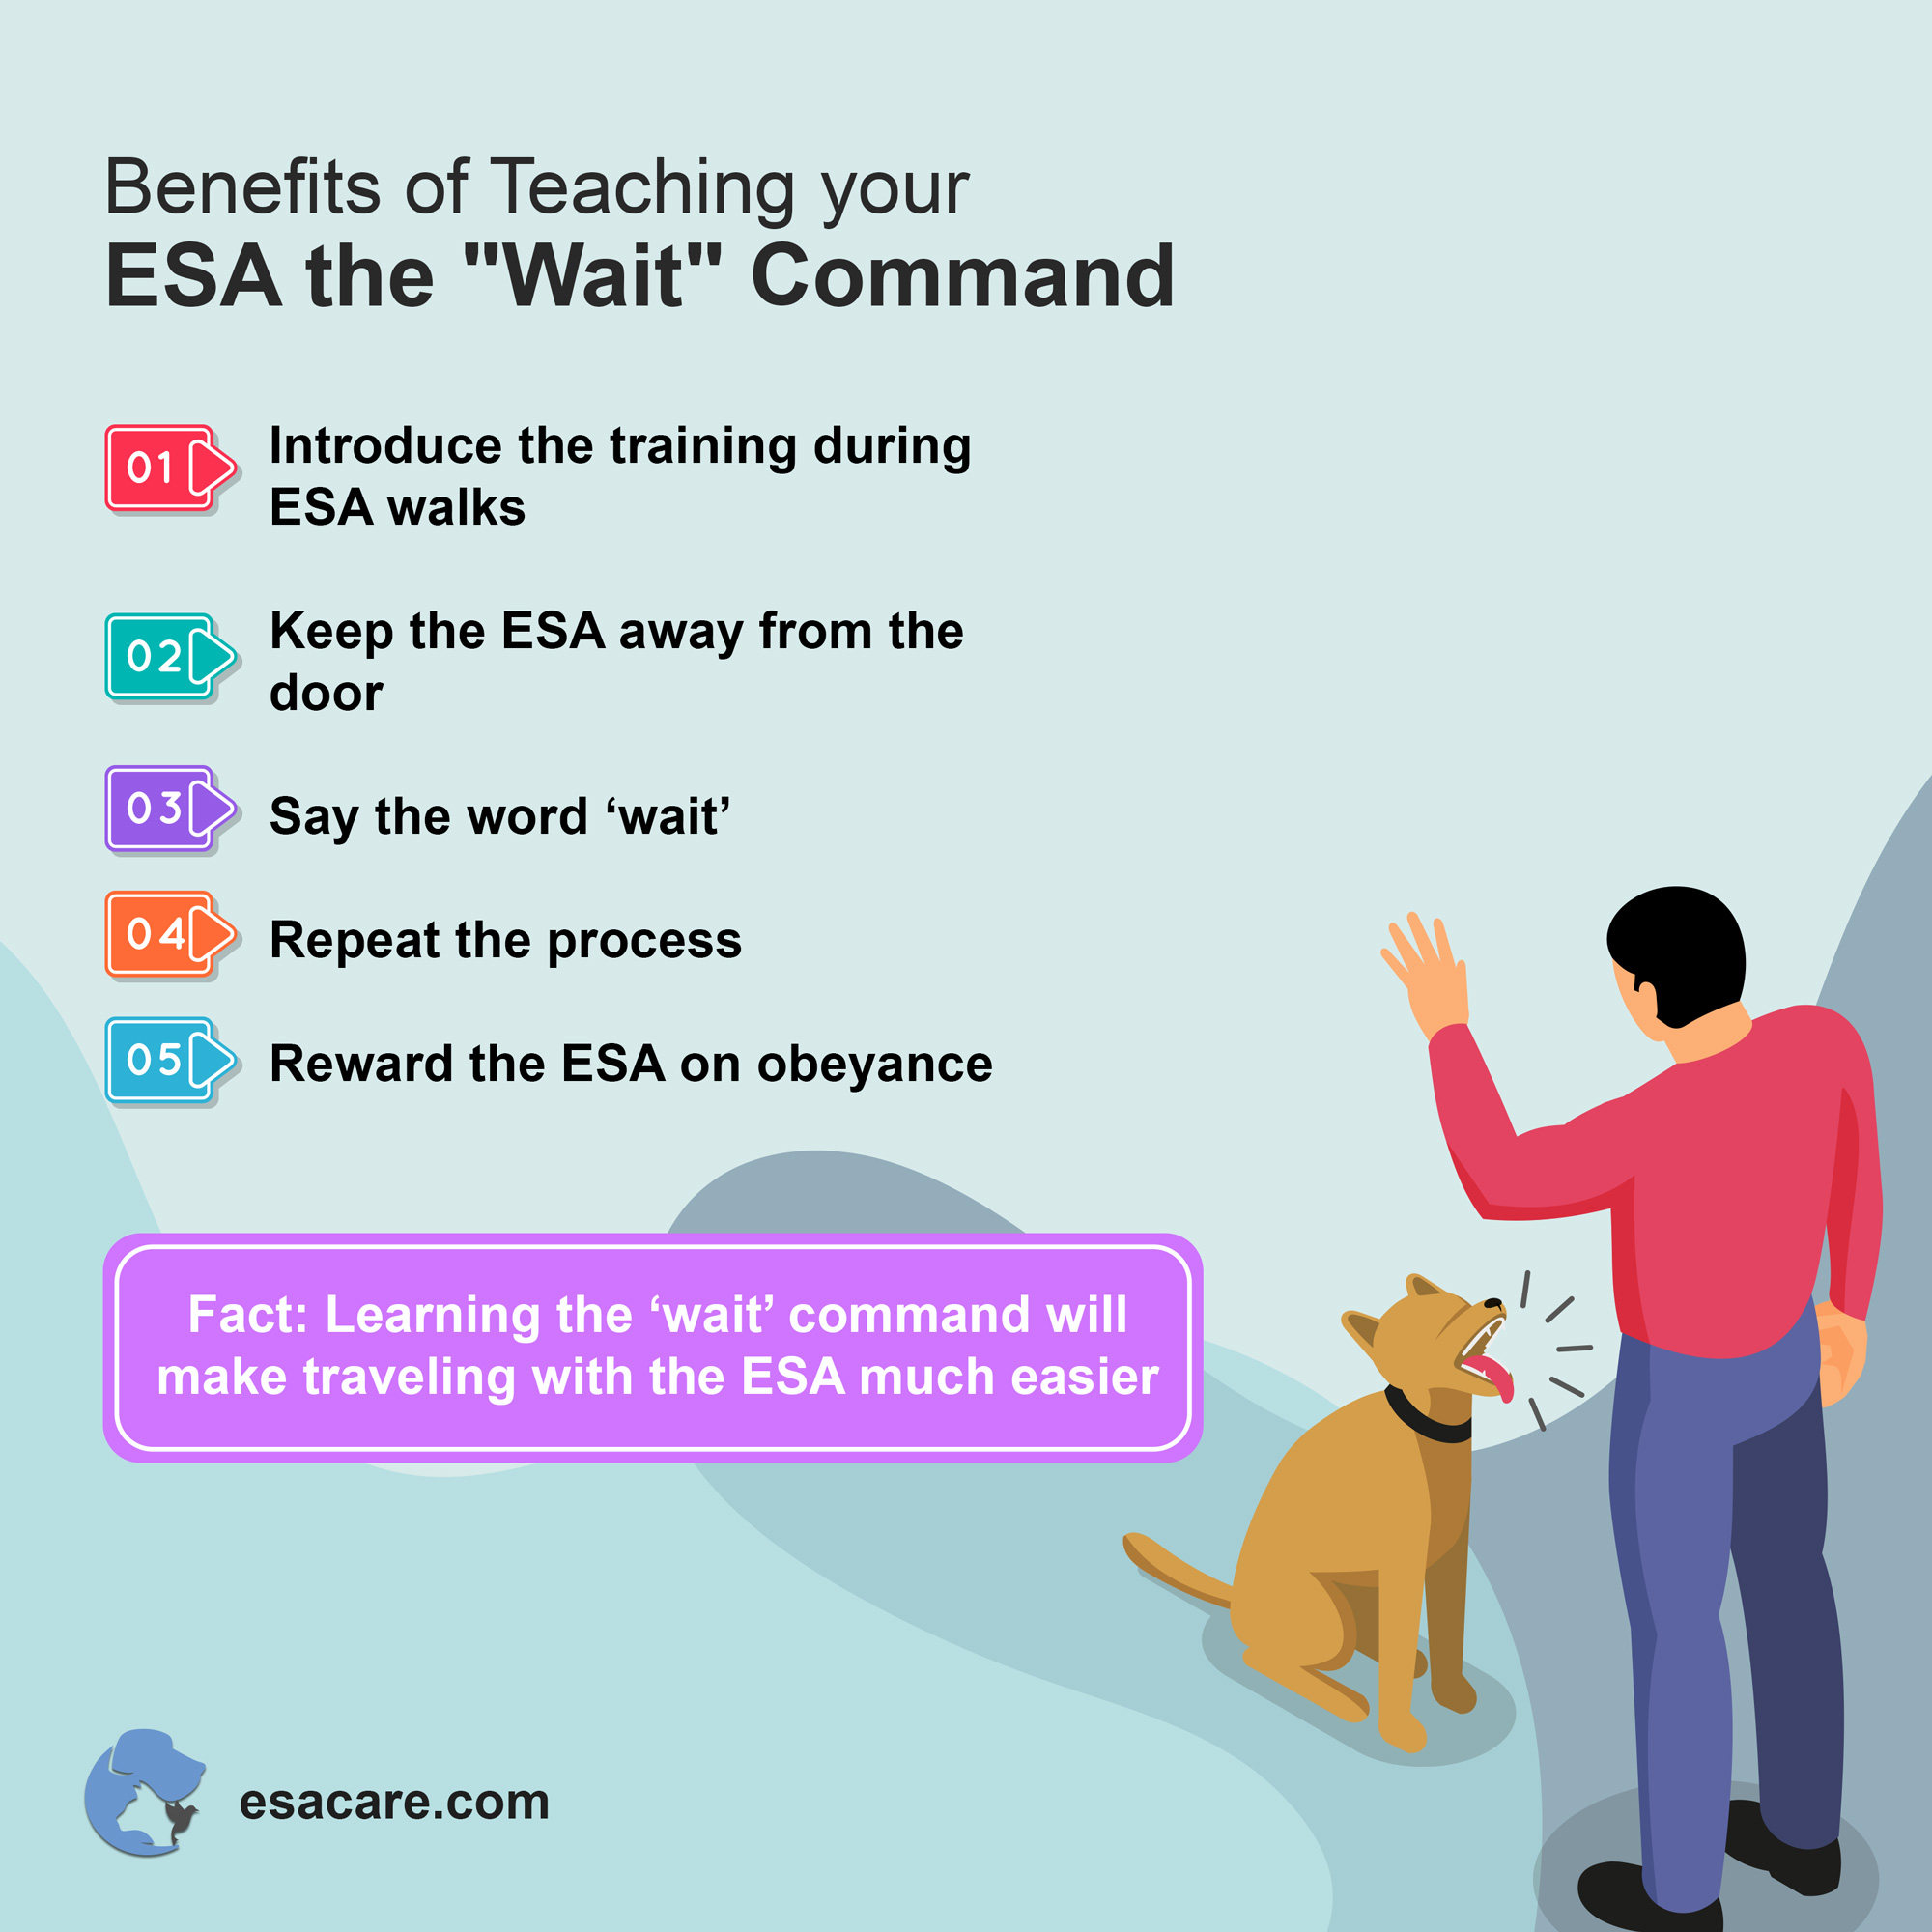 ESA wait command